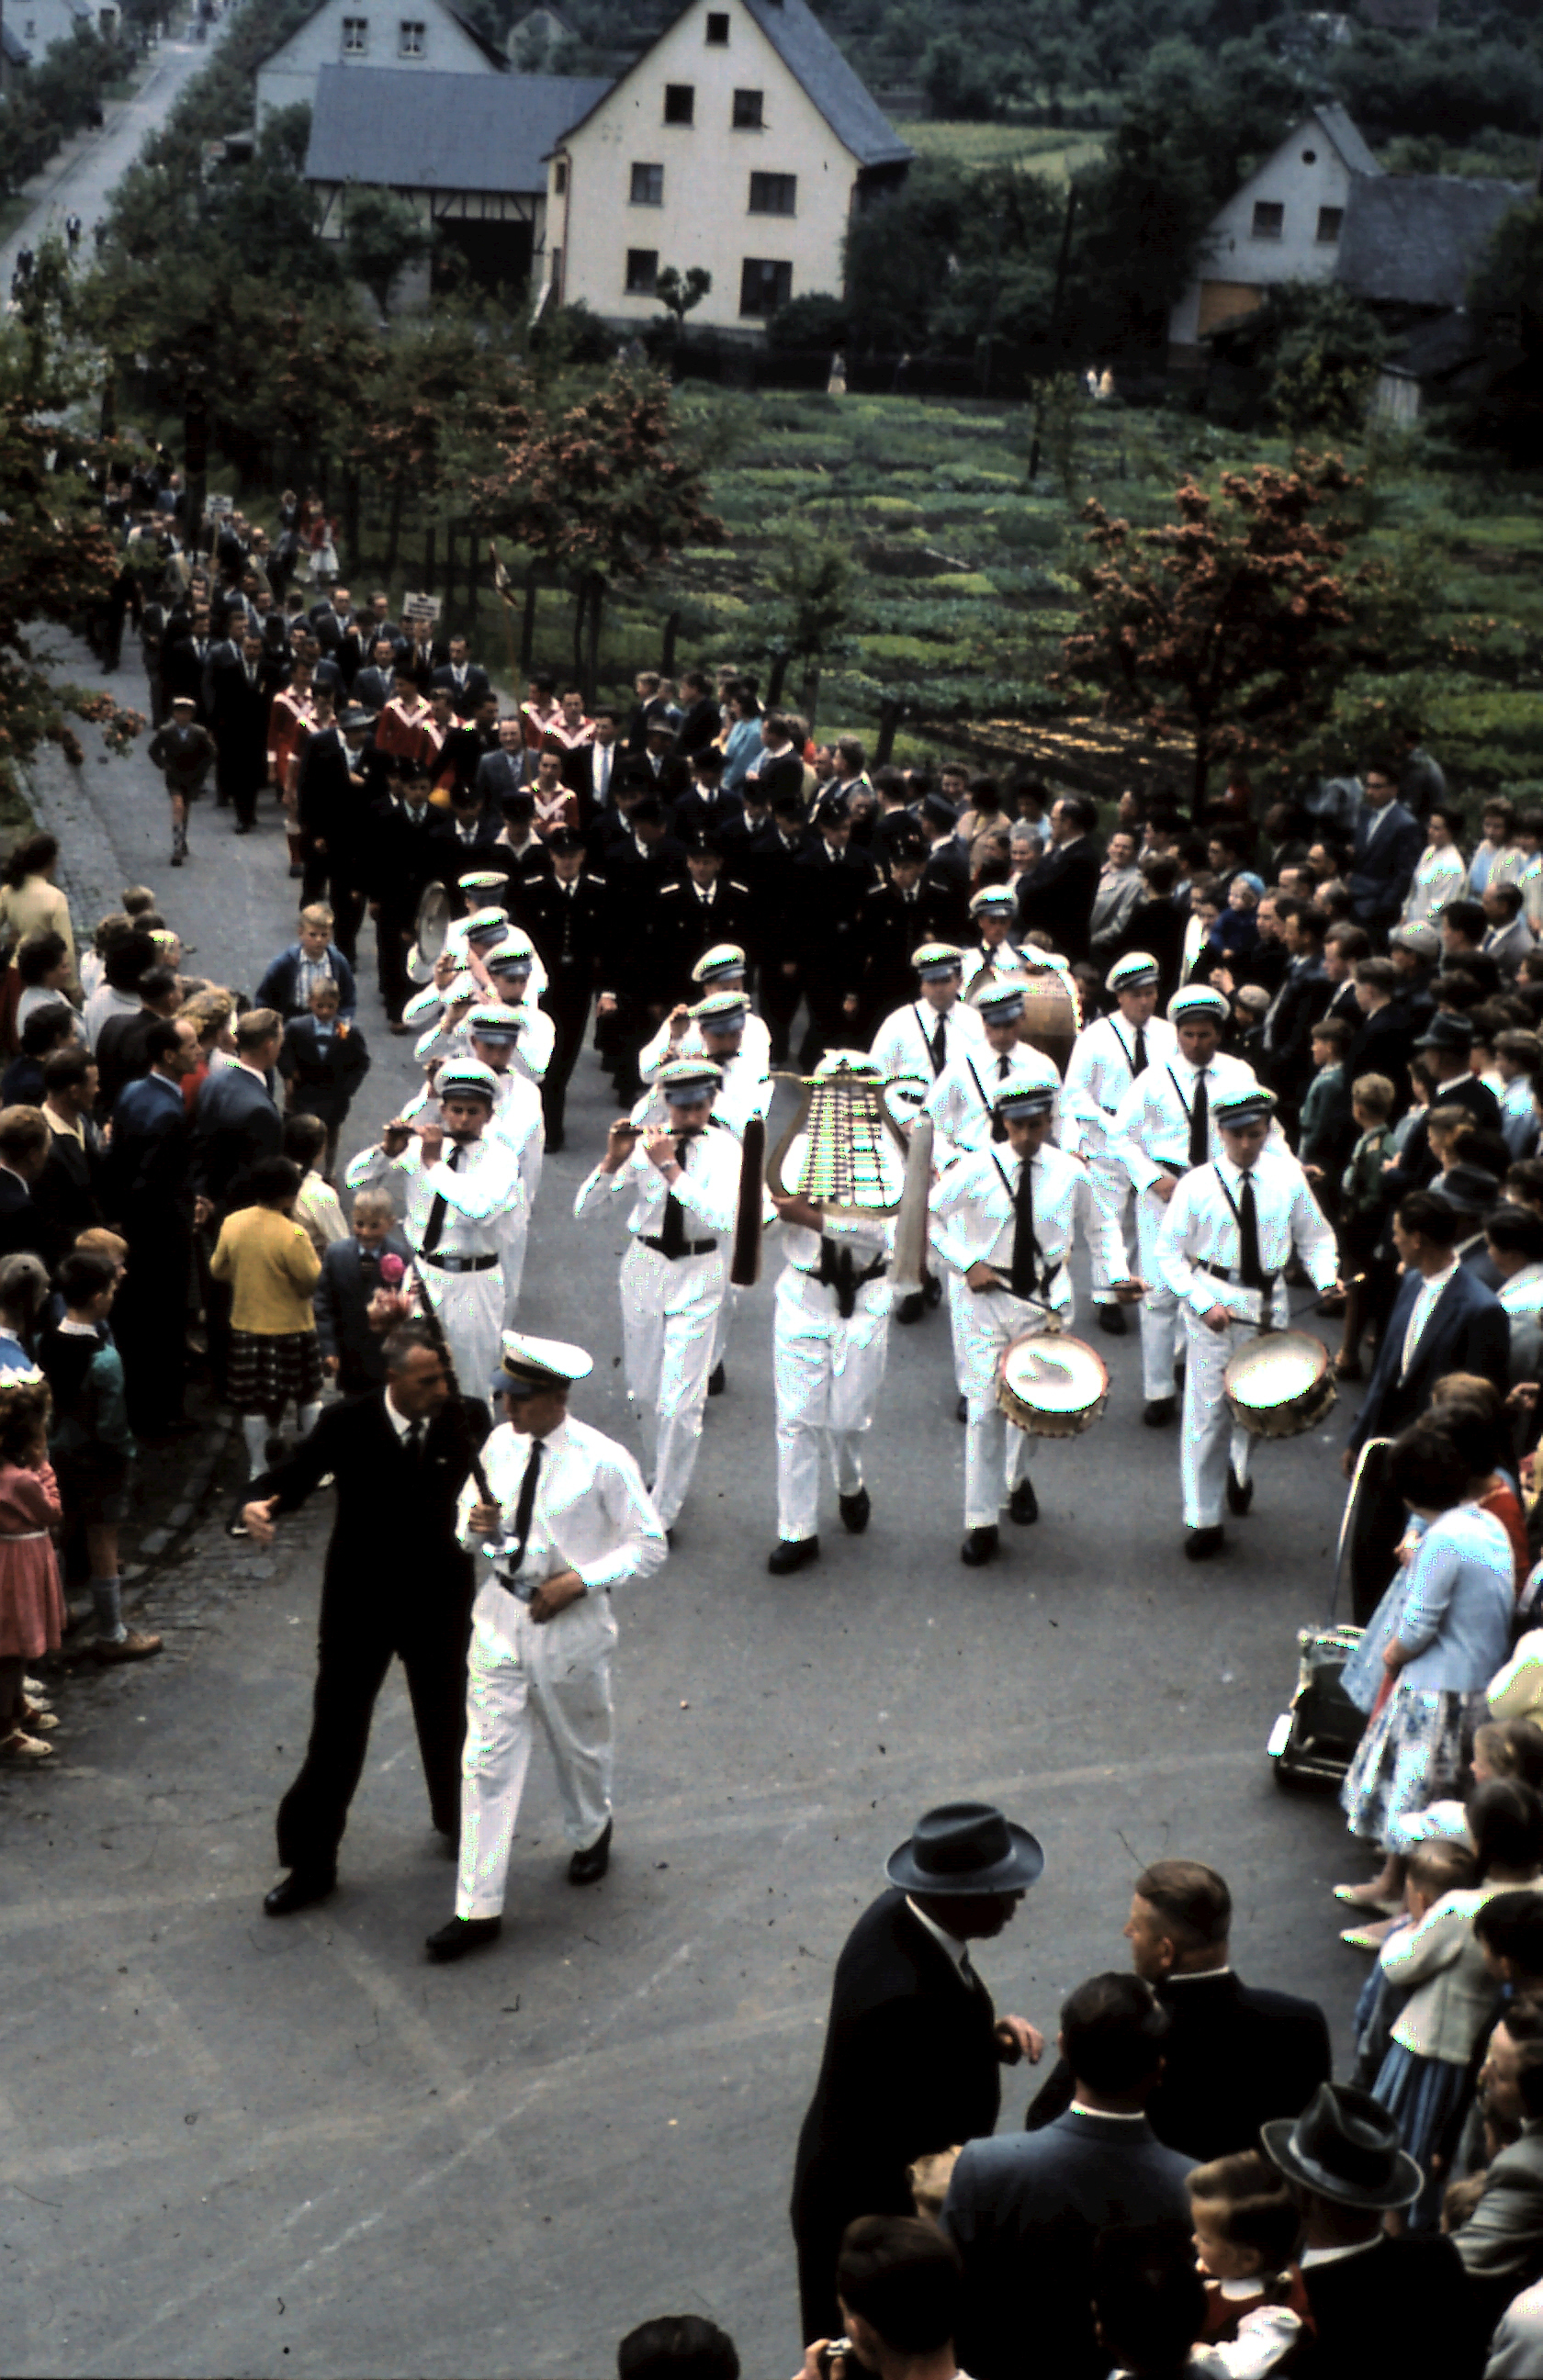 1-saengerfest-1959-0001.jpg